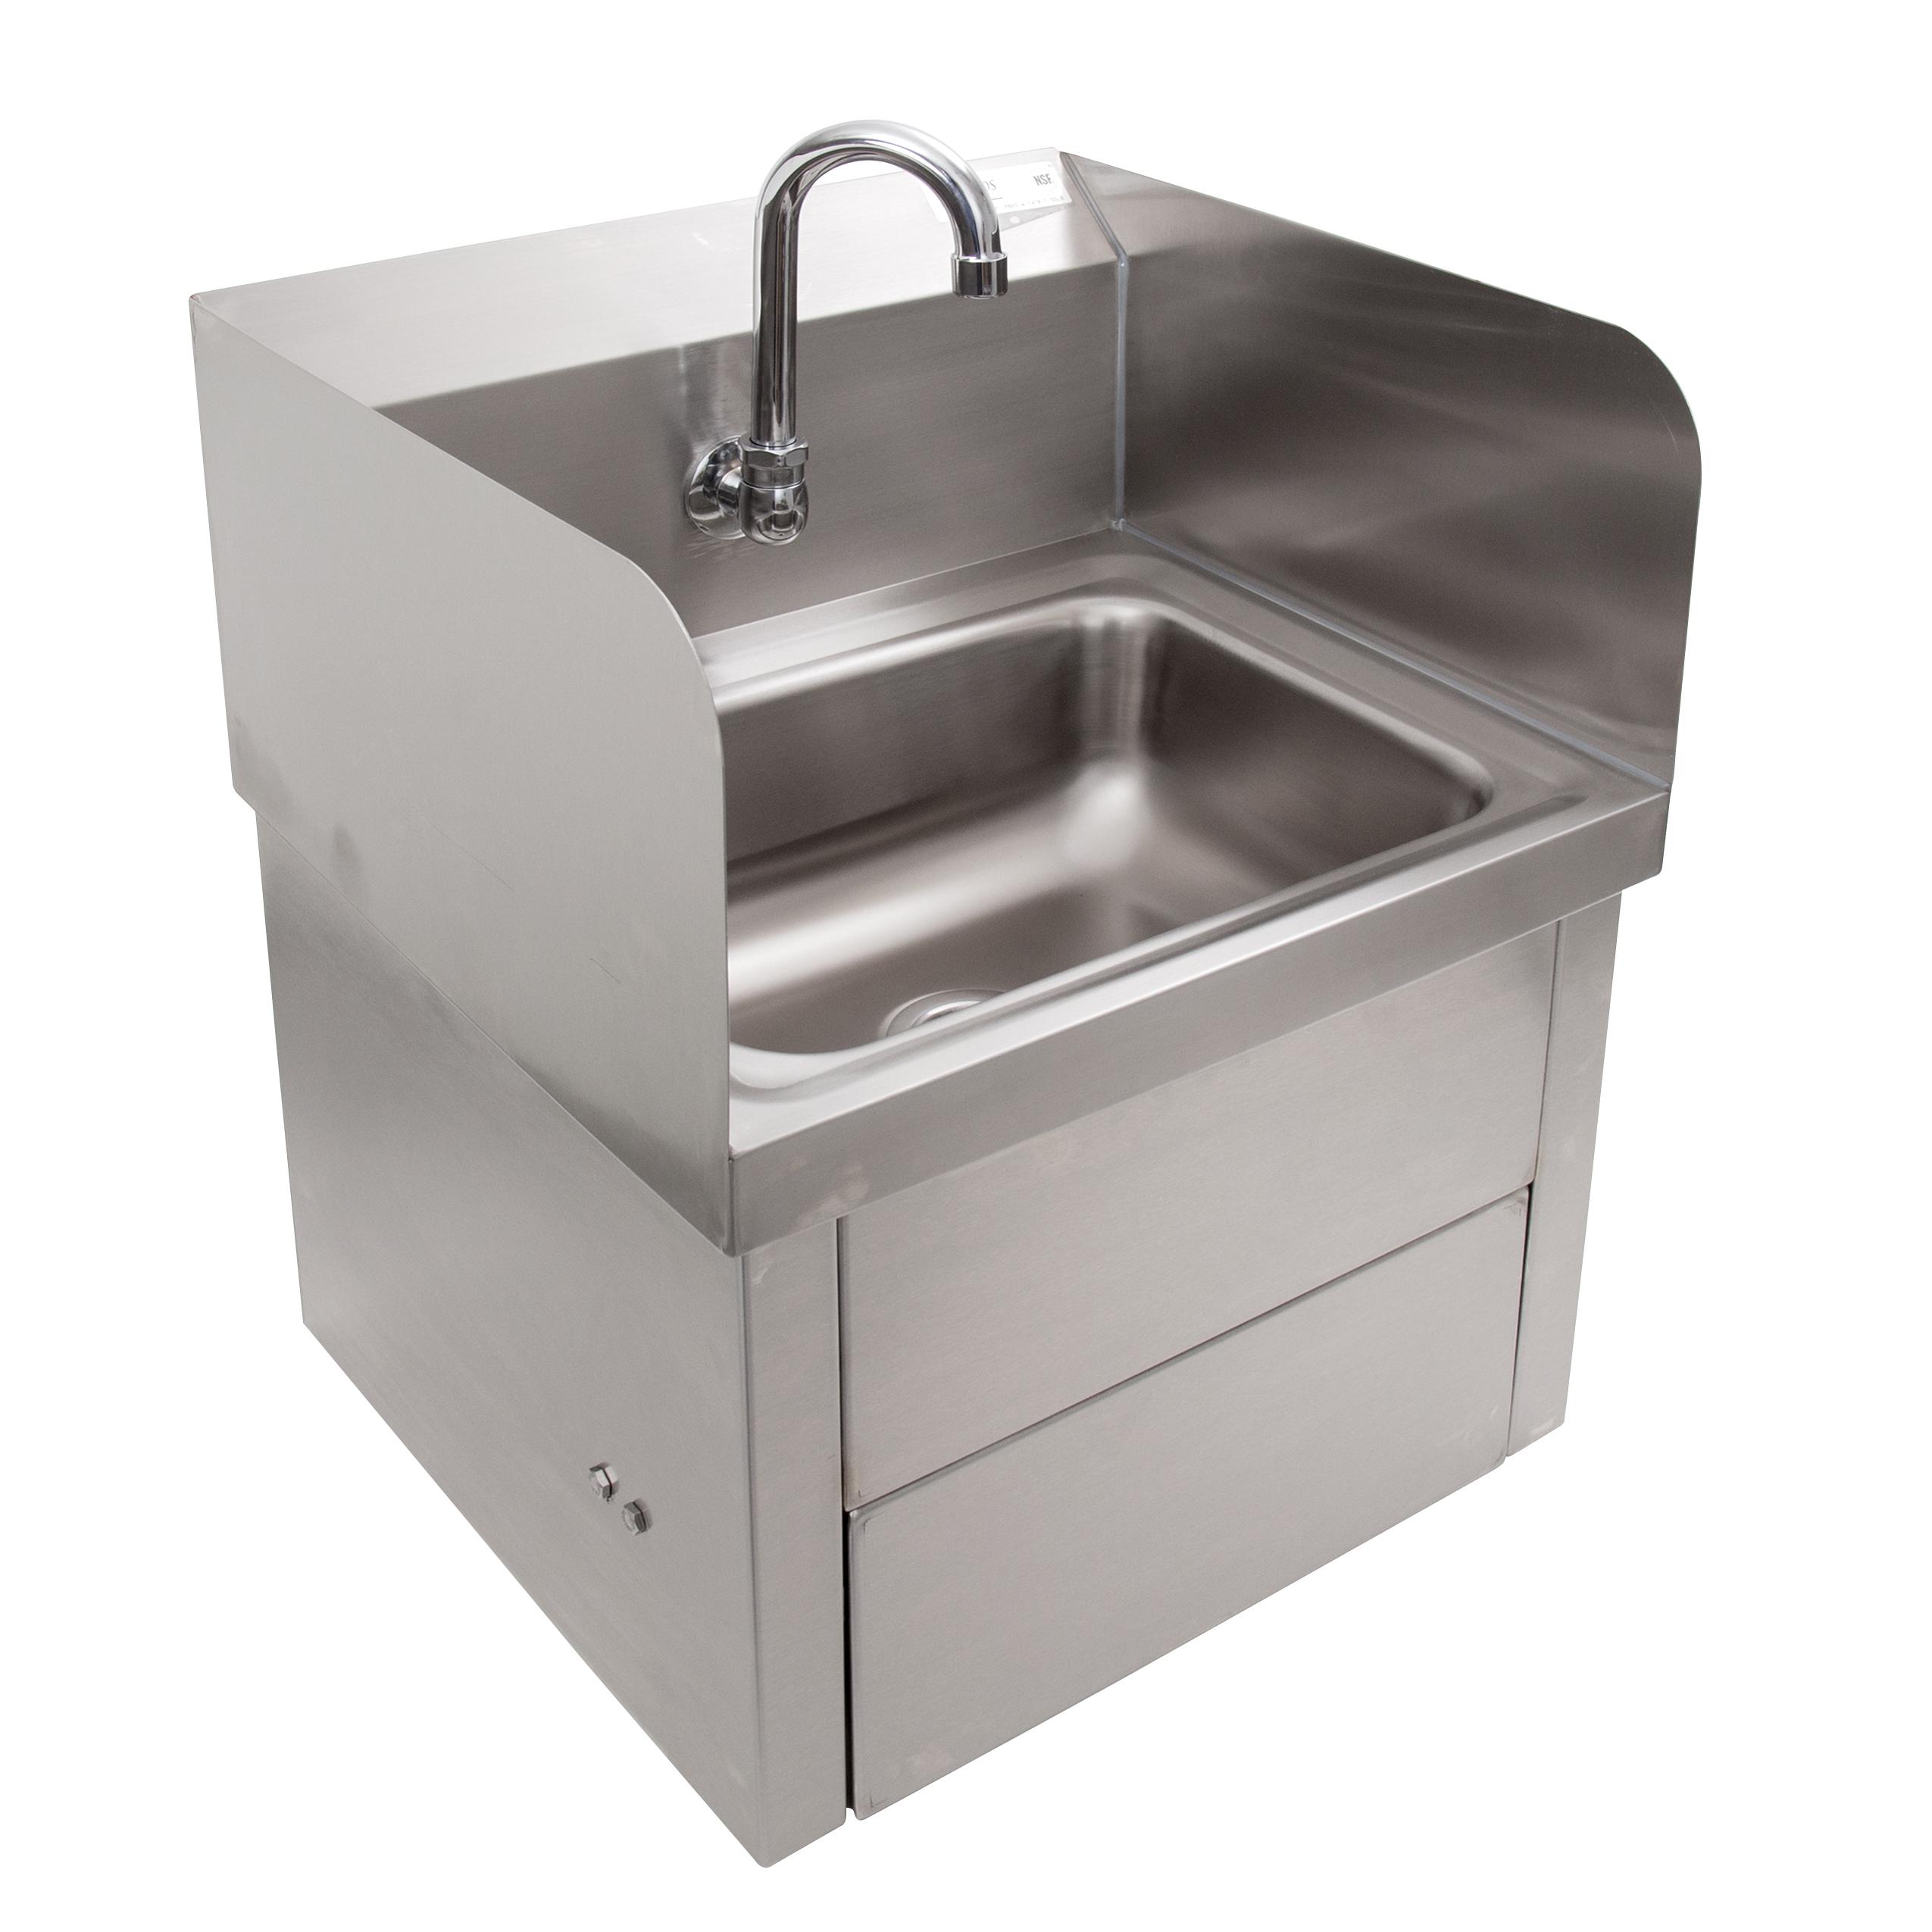 John Boos PBHS-W-1410-KV1APS-SS sink, hand